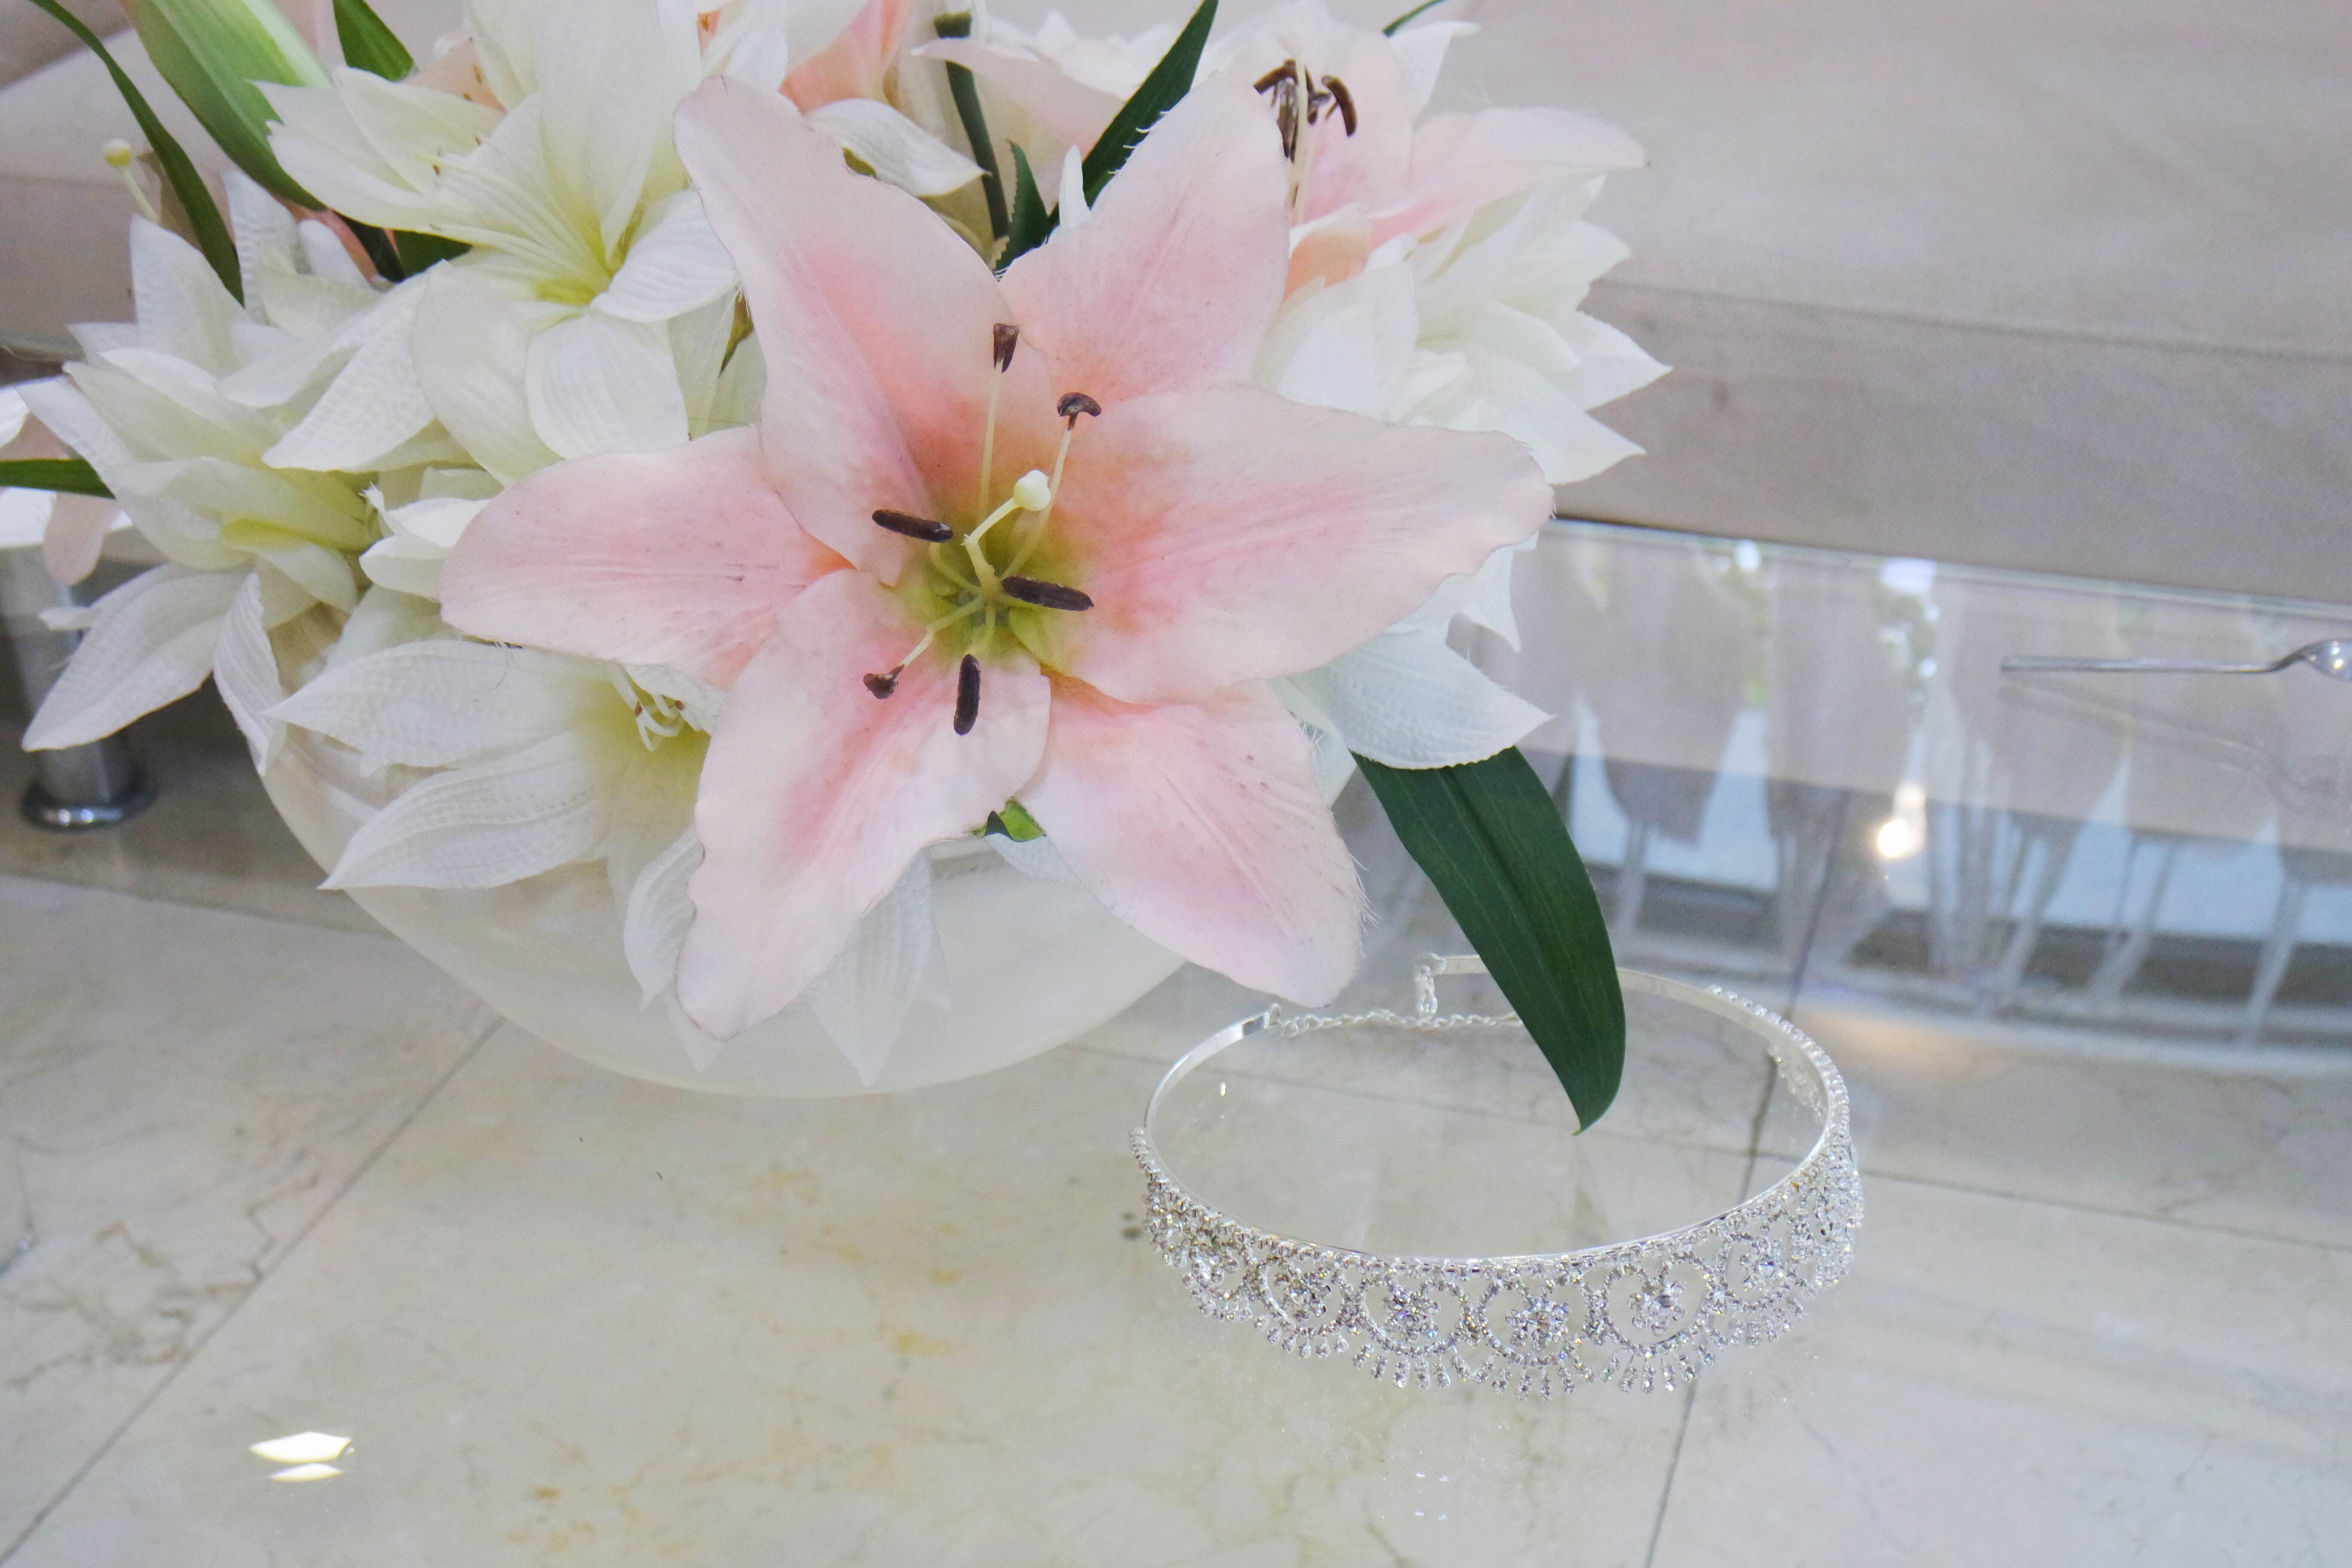 gelinlik-tasarim-markasi-weddies-bride-wear-nisantasi-gelinlikci